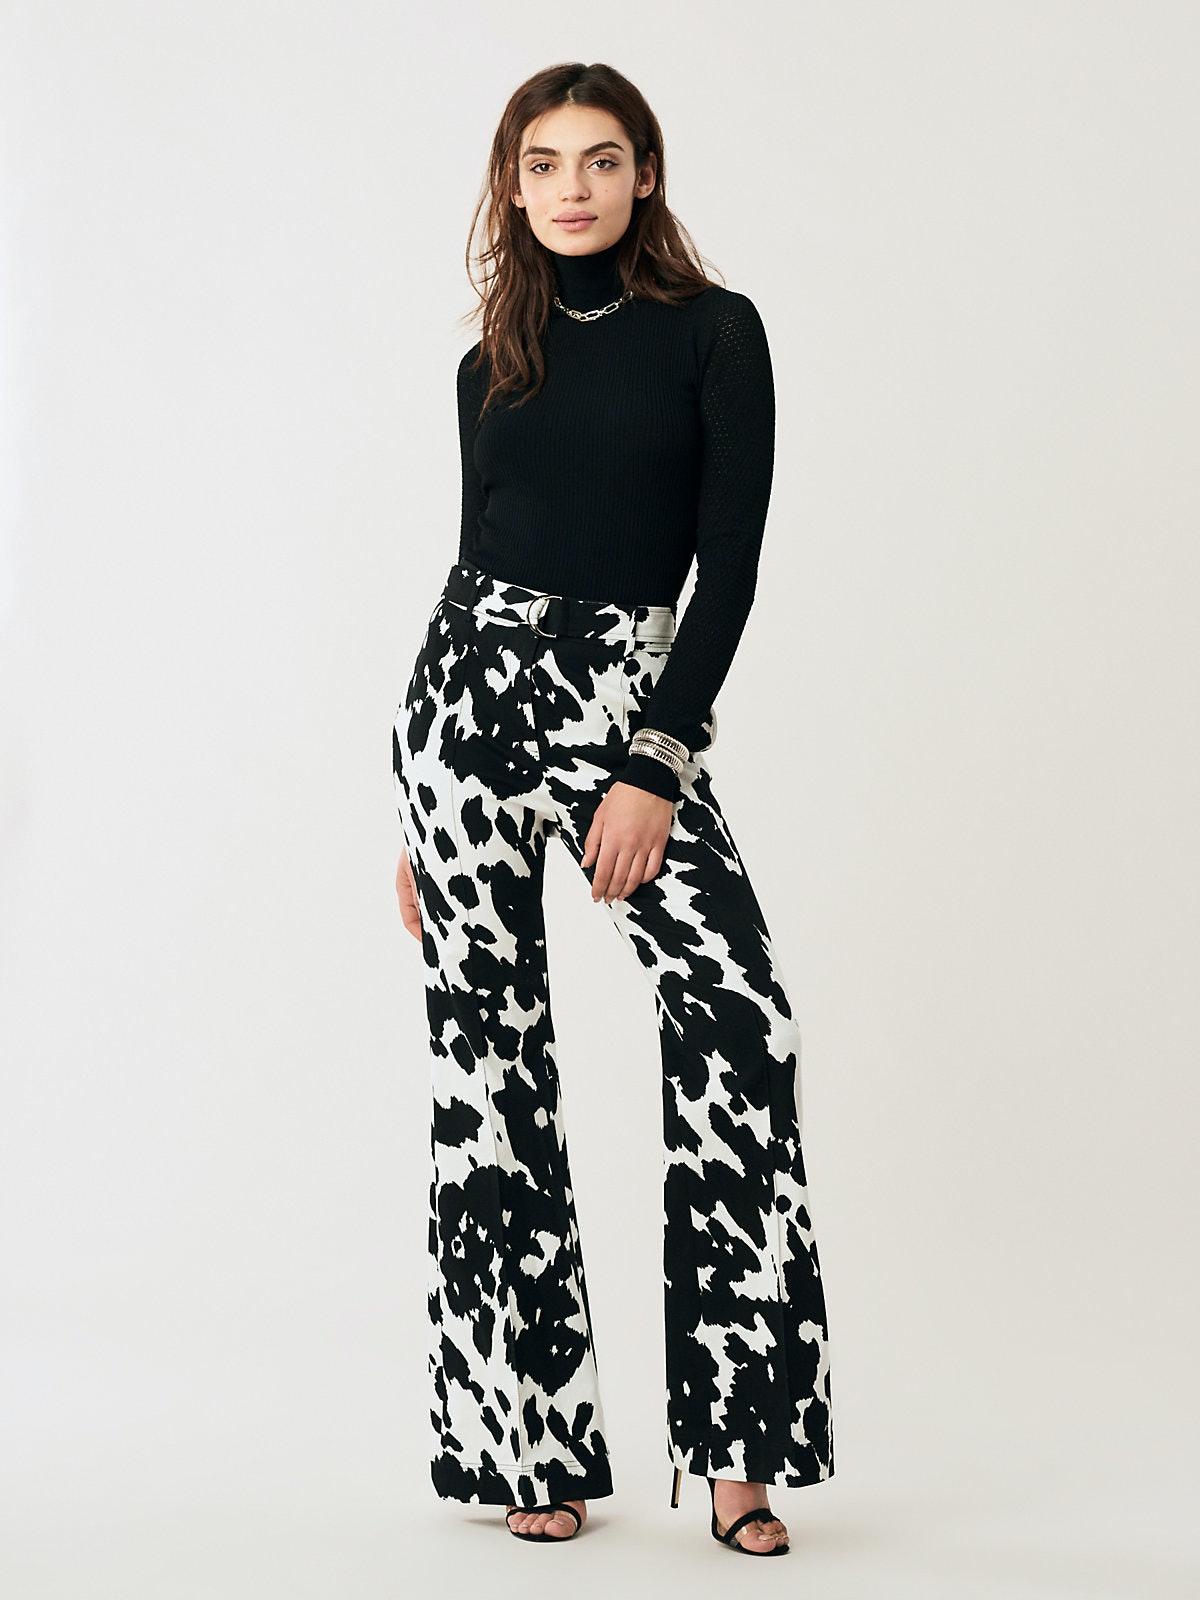 Joan Cotton Flare Pants